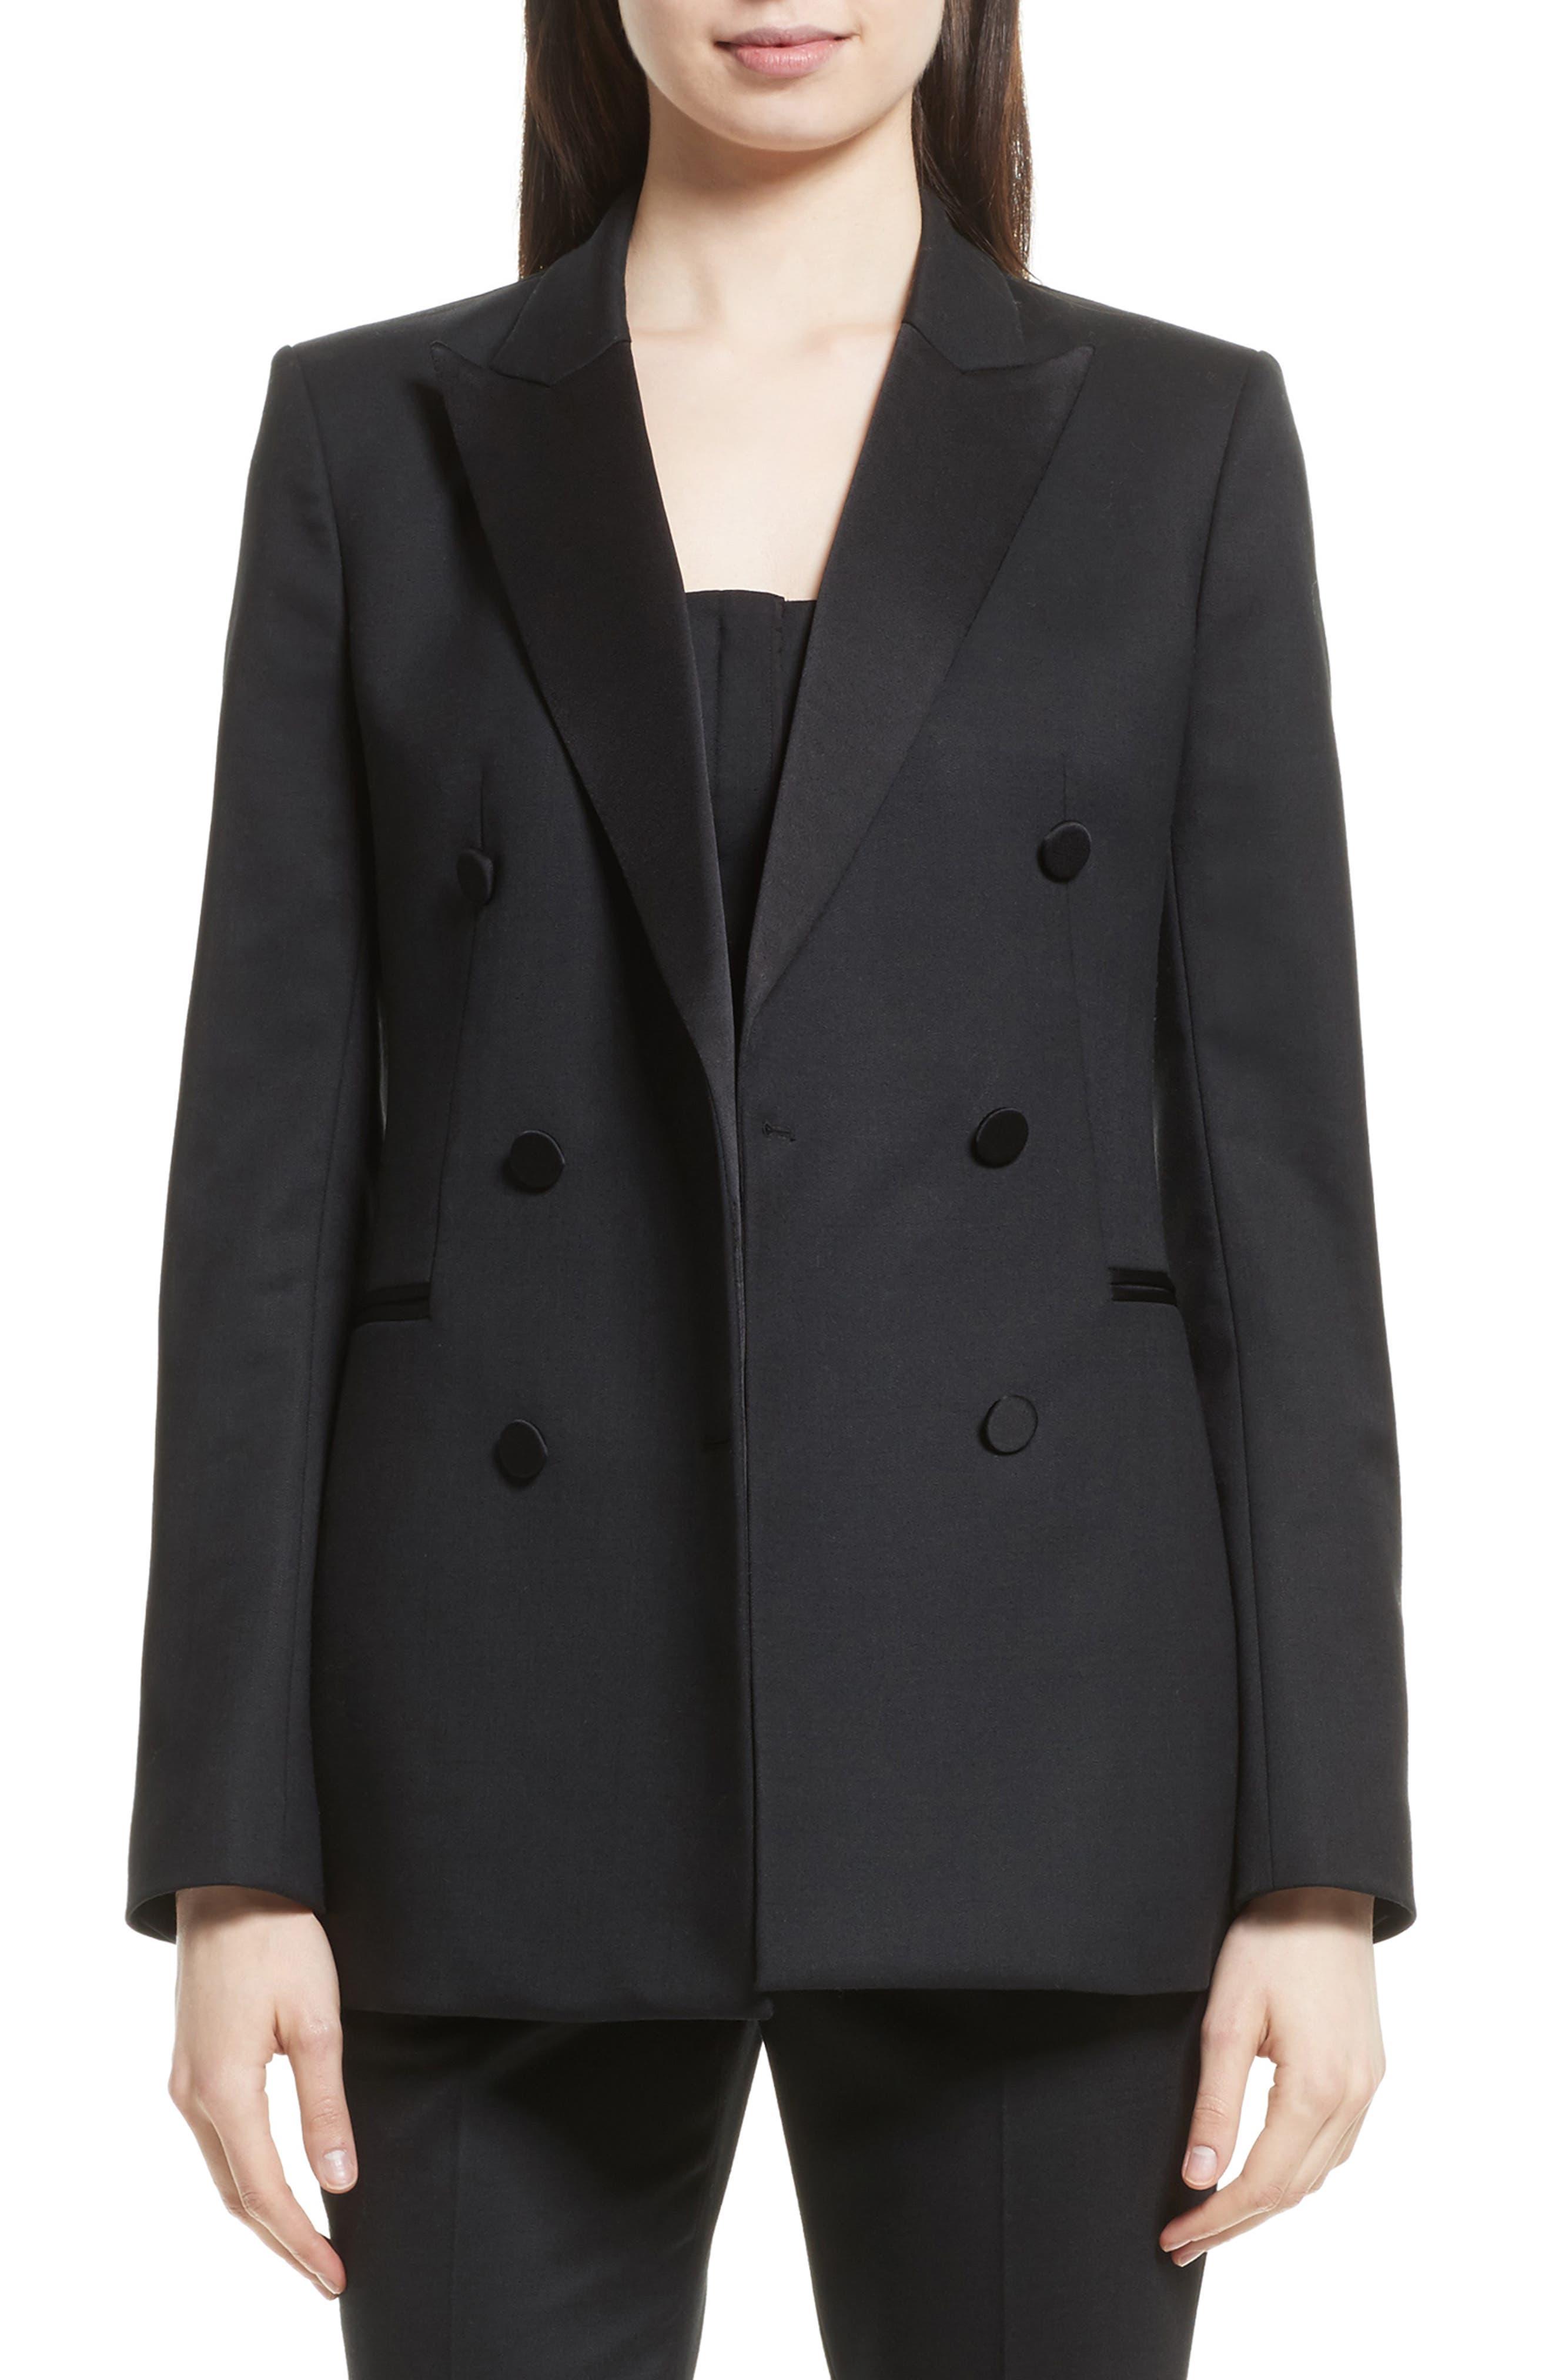 Wool Blend Tuxedo Jacket,                             Main thumbnail 1, color,                             Black